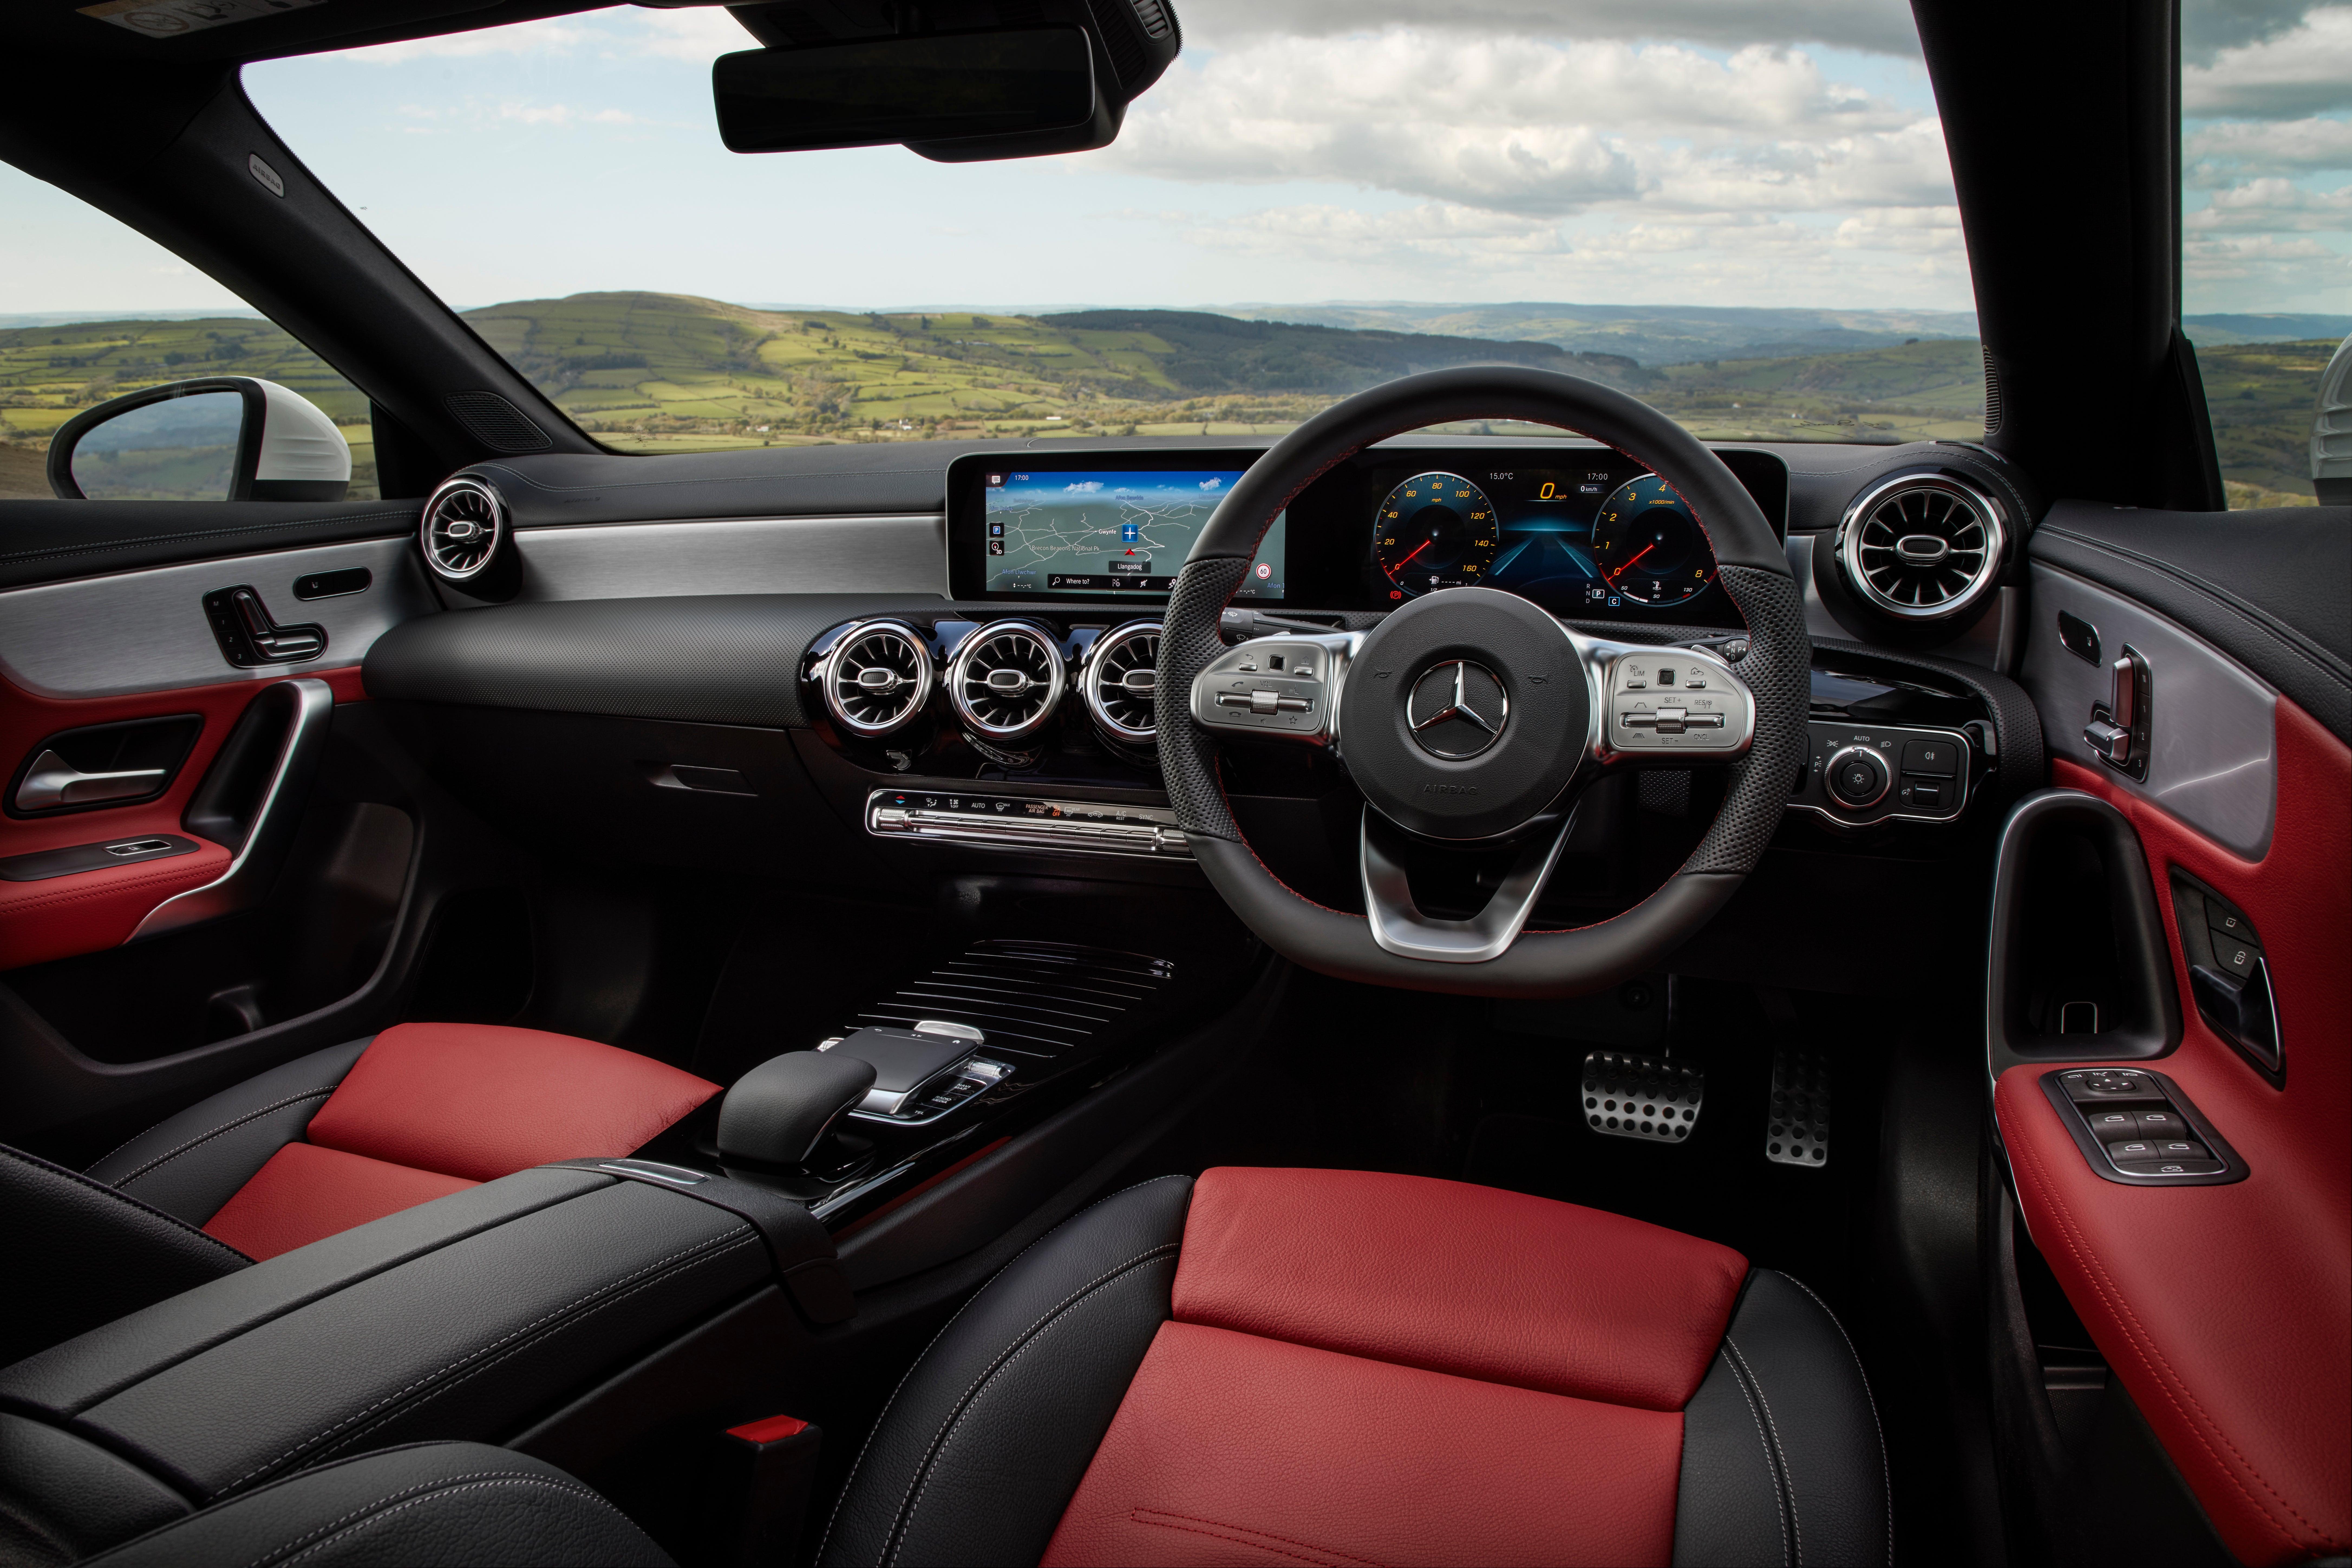 Mercedes CLA front interior